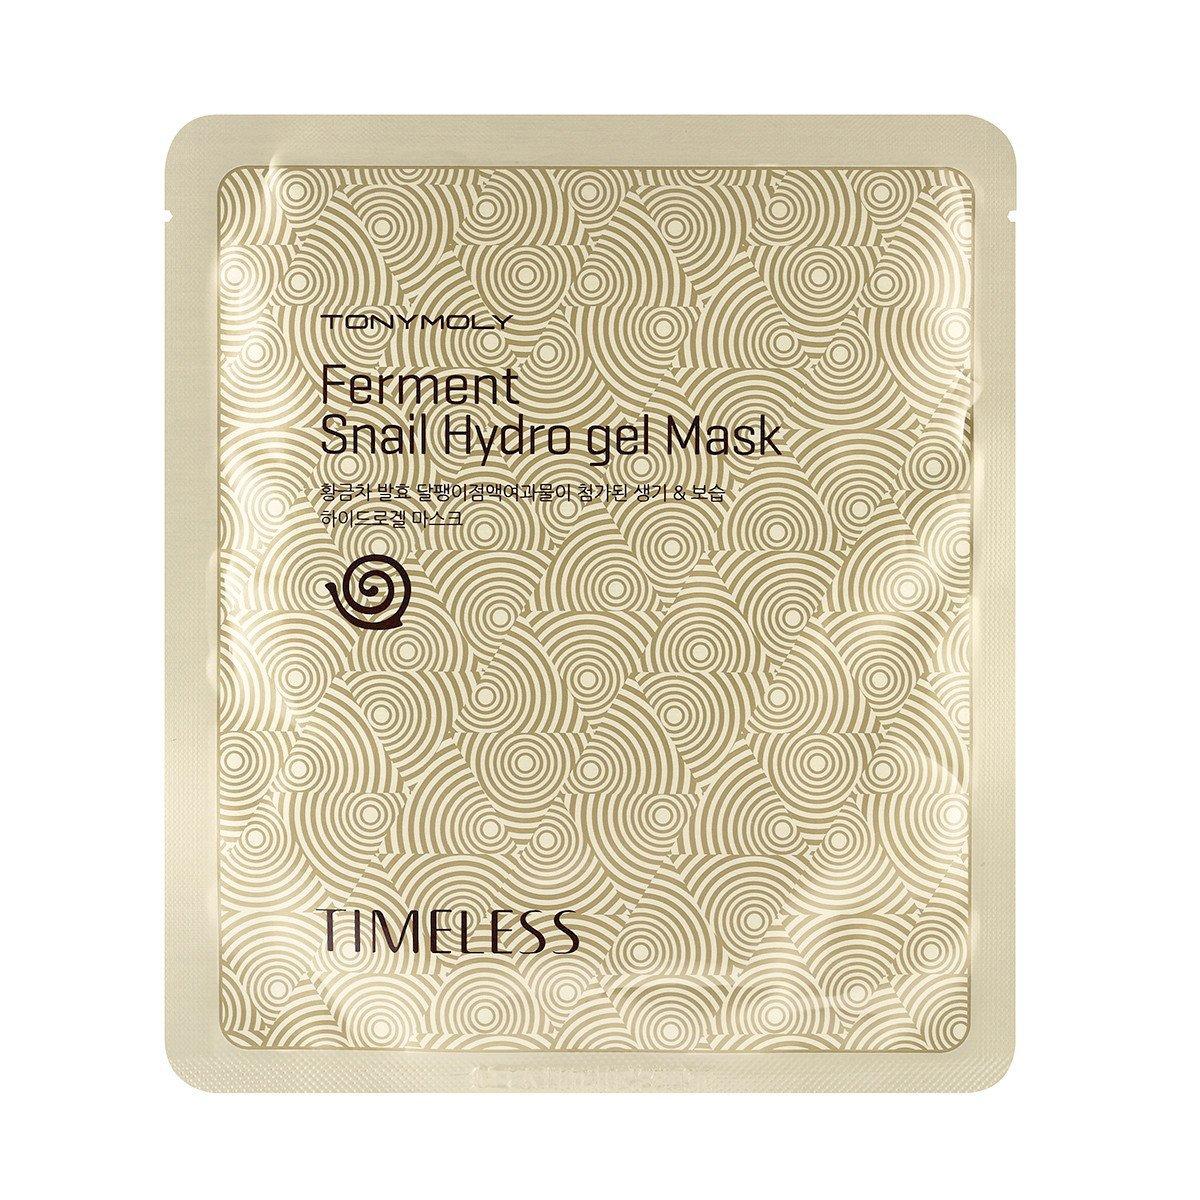 TonyMoly Timeless Ferment Snail Hydrogel Mask